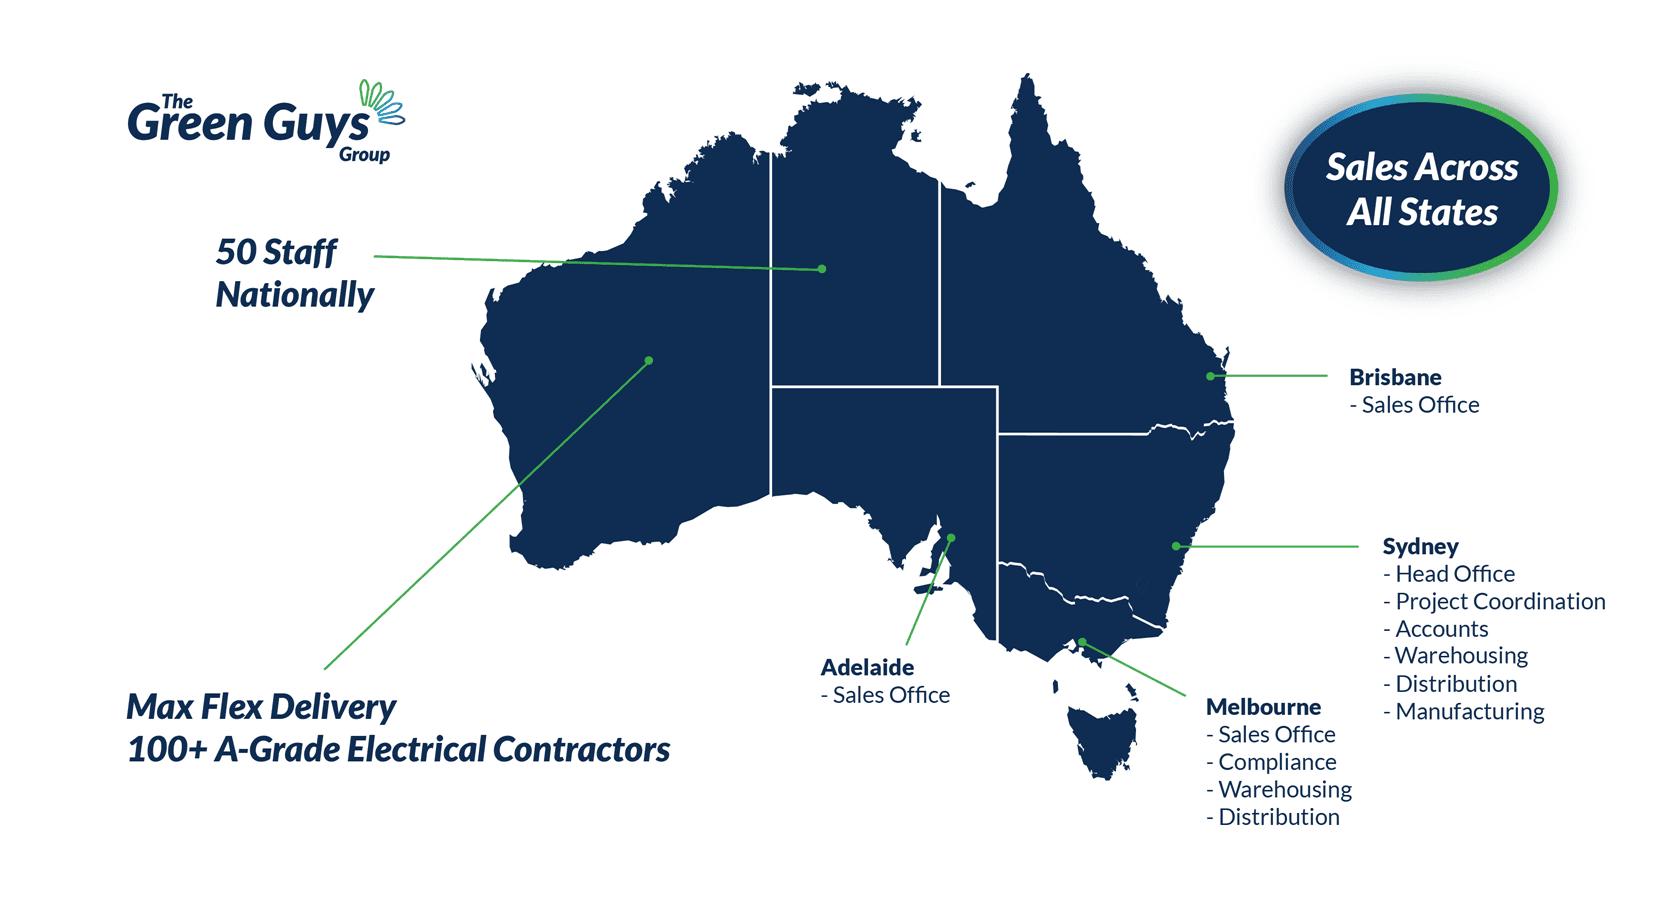 Our presense accross four states in Australia - The Green Guys Group